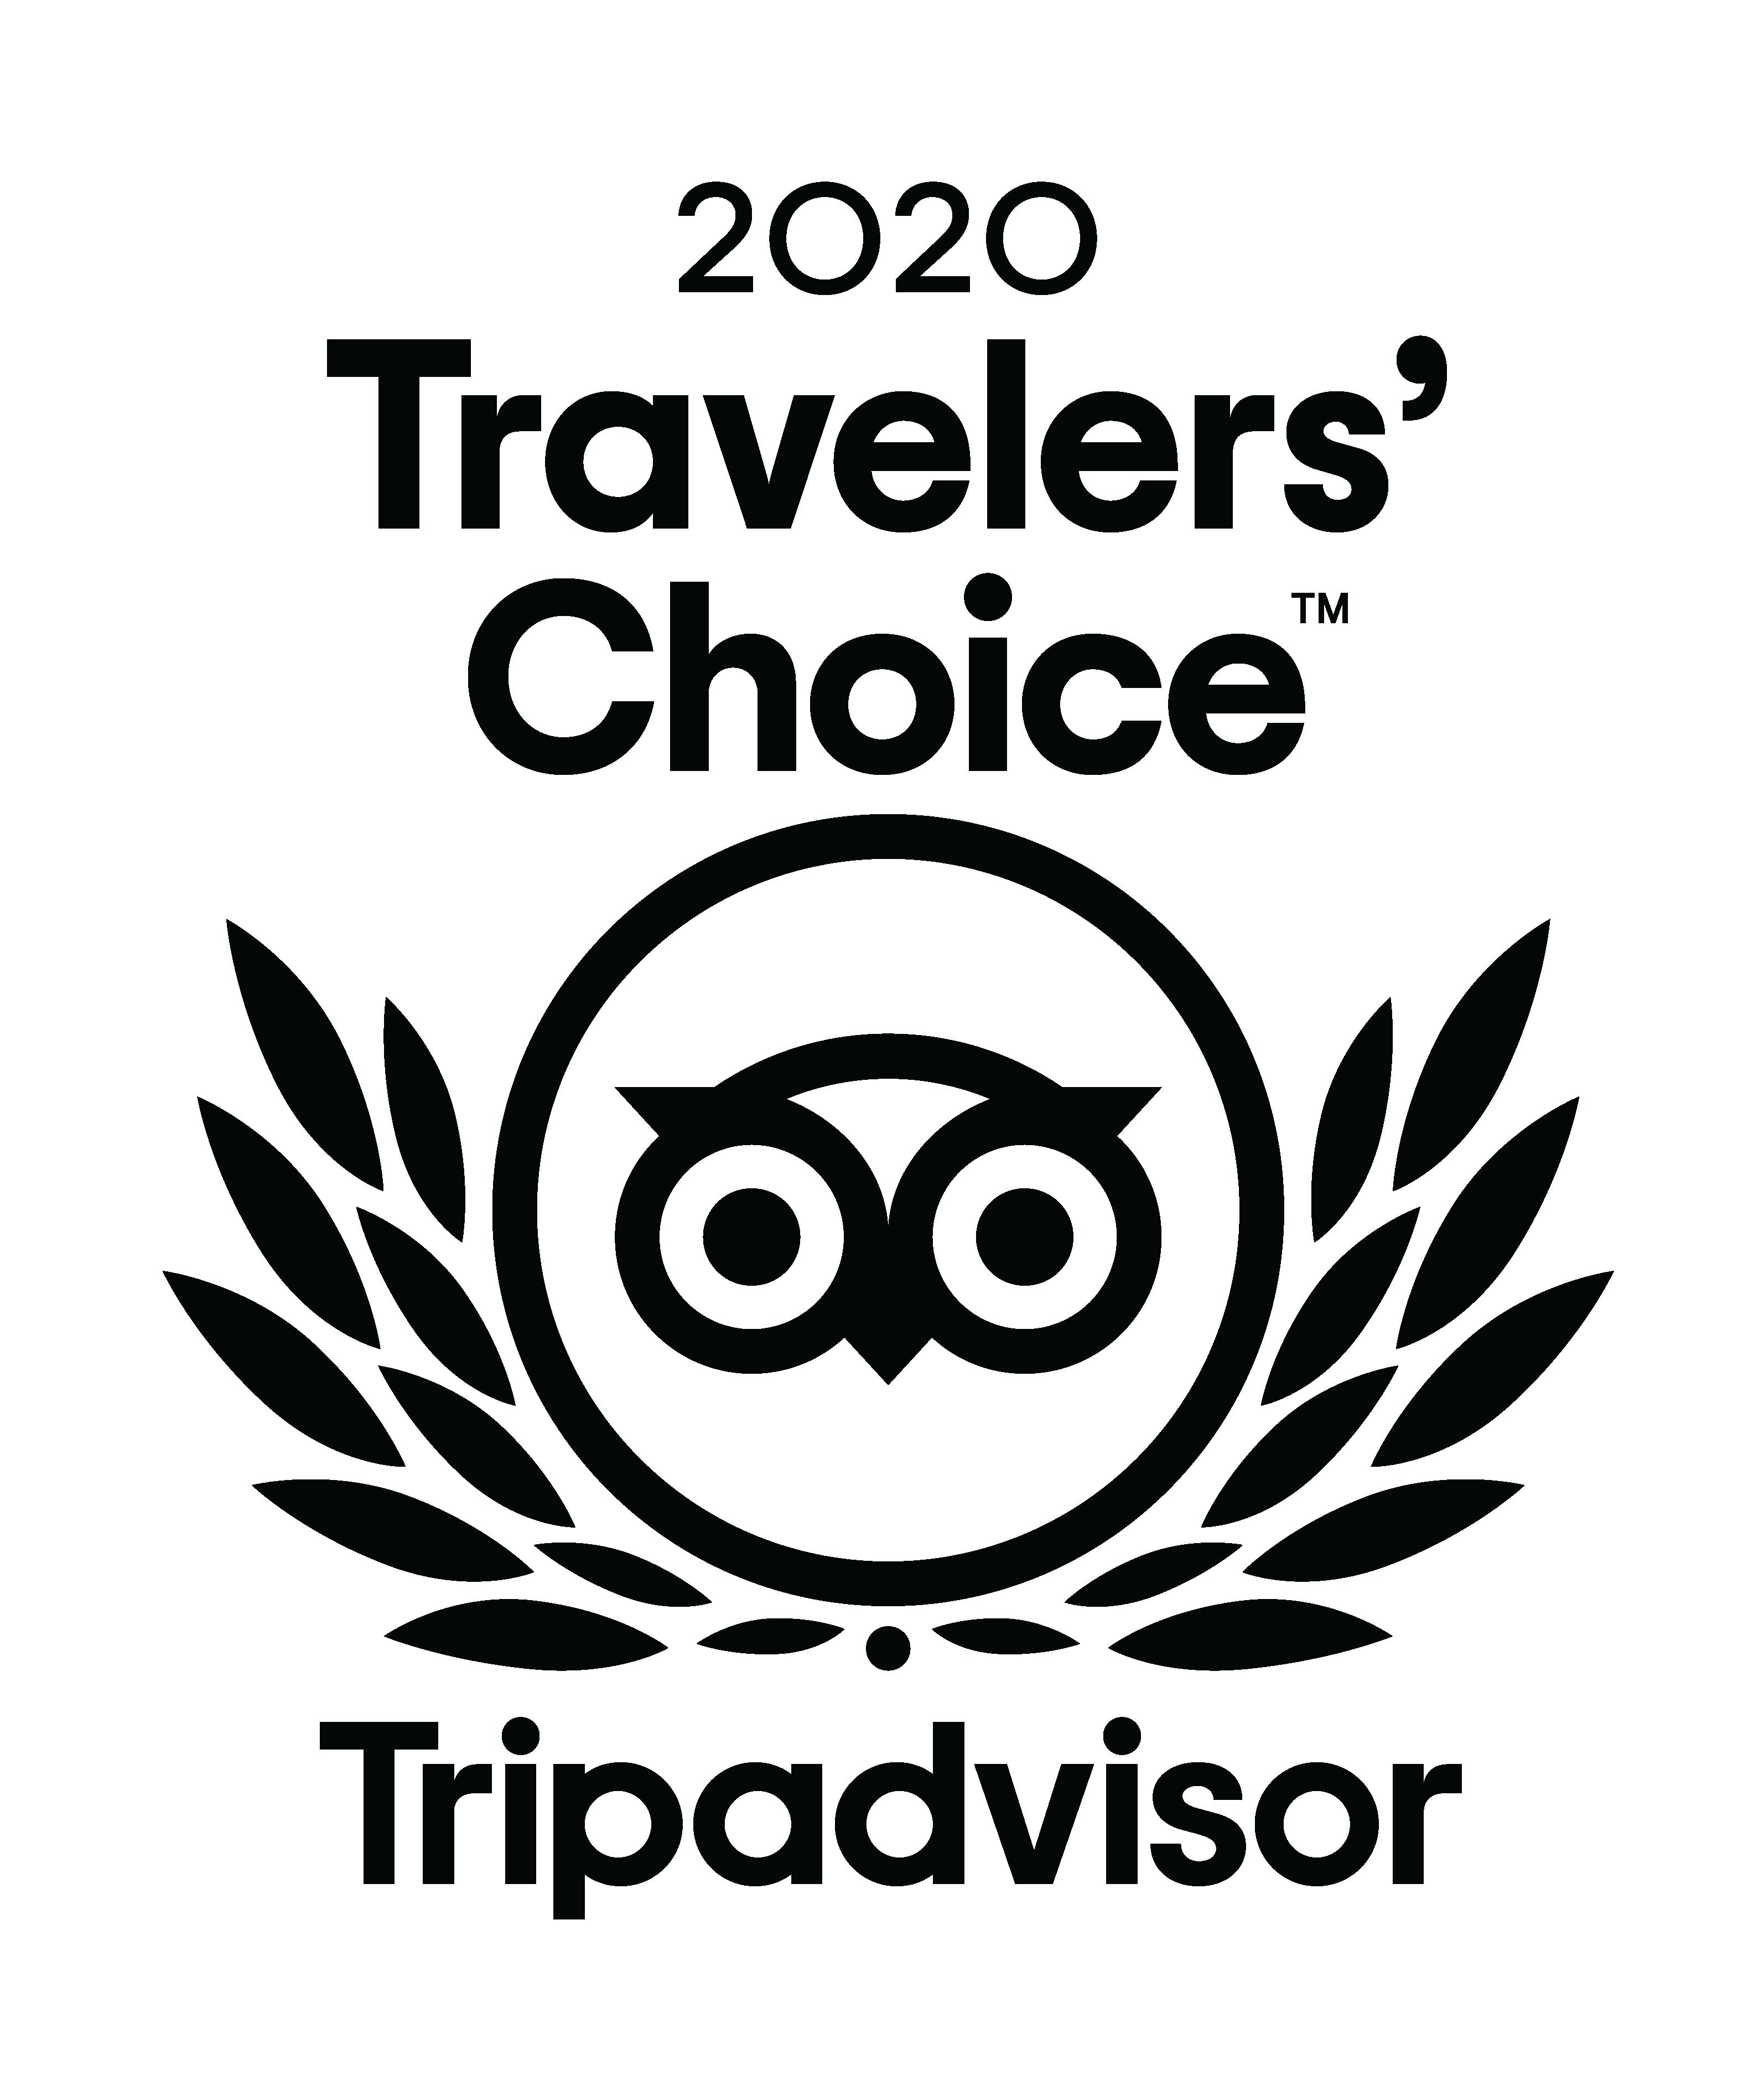 Seven Feathers Casino Resort Has Won The 2020 Travelers' Choice Award From Tripadvisor